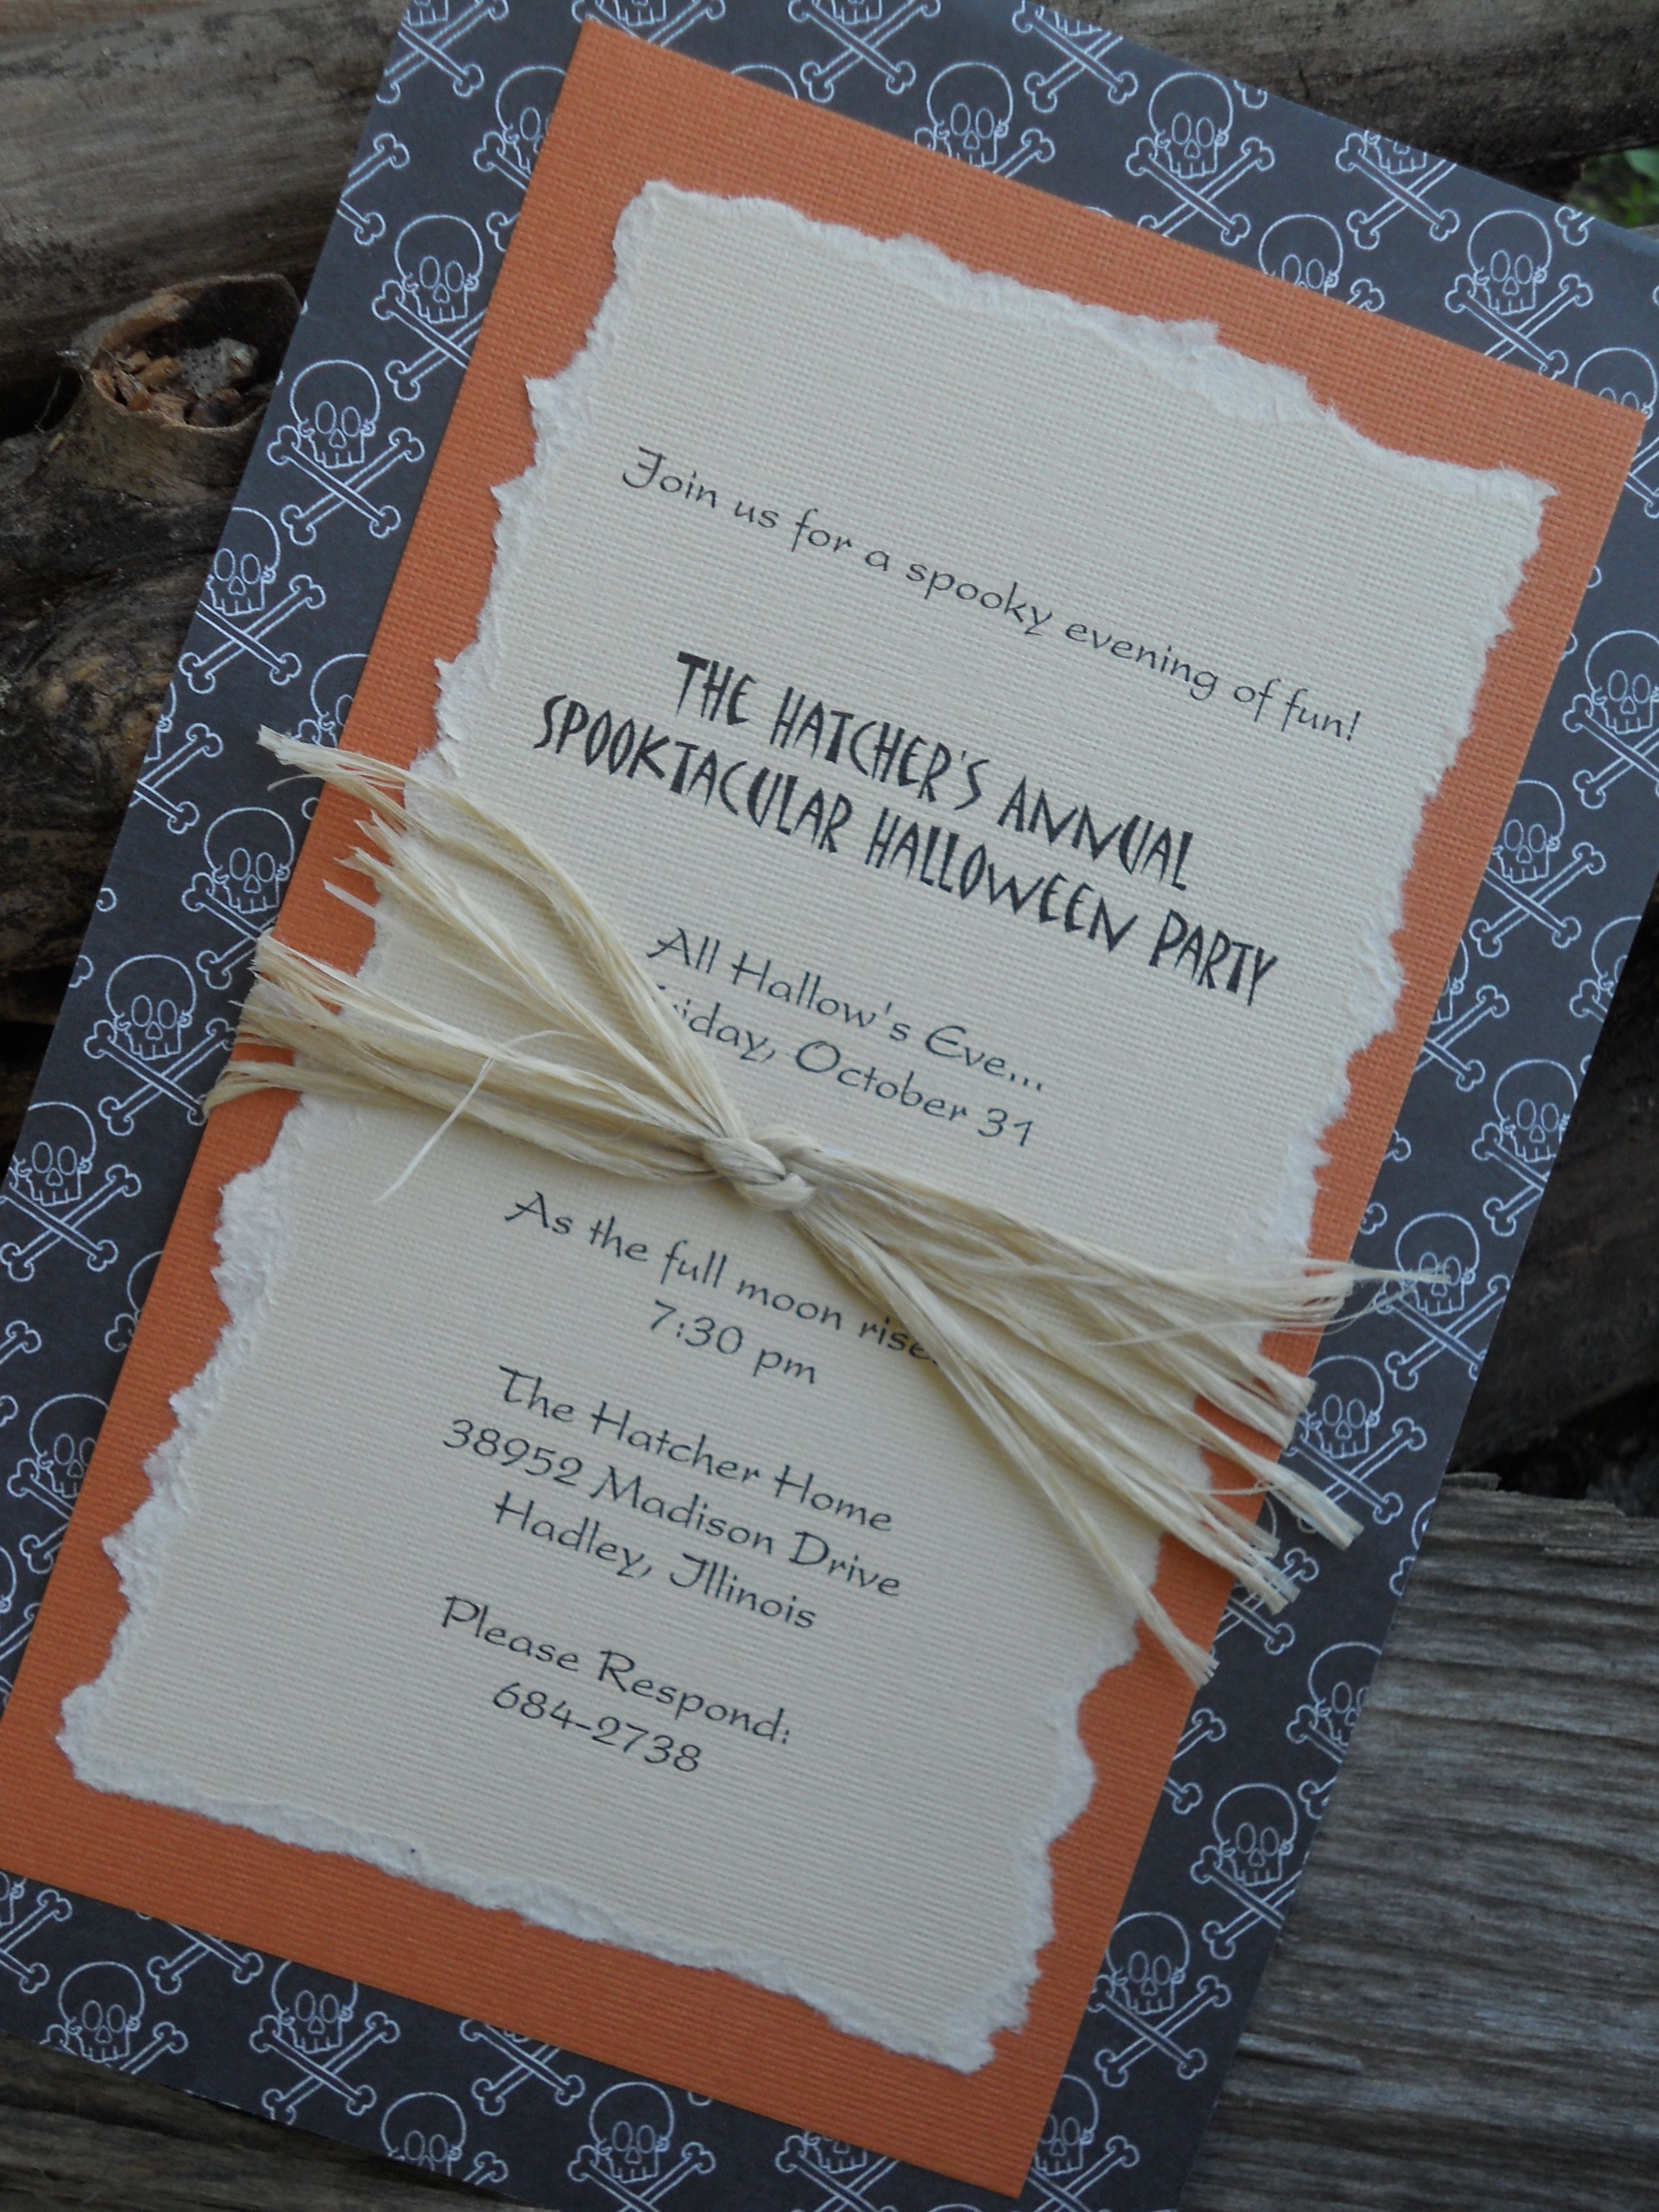 homemade invitations-halloween5-1 | Halloween | Pinterest ...